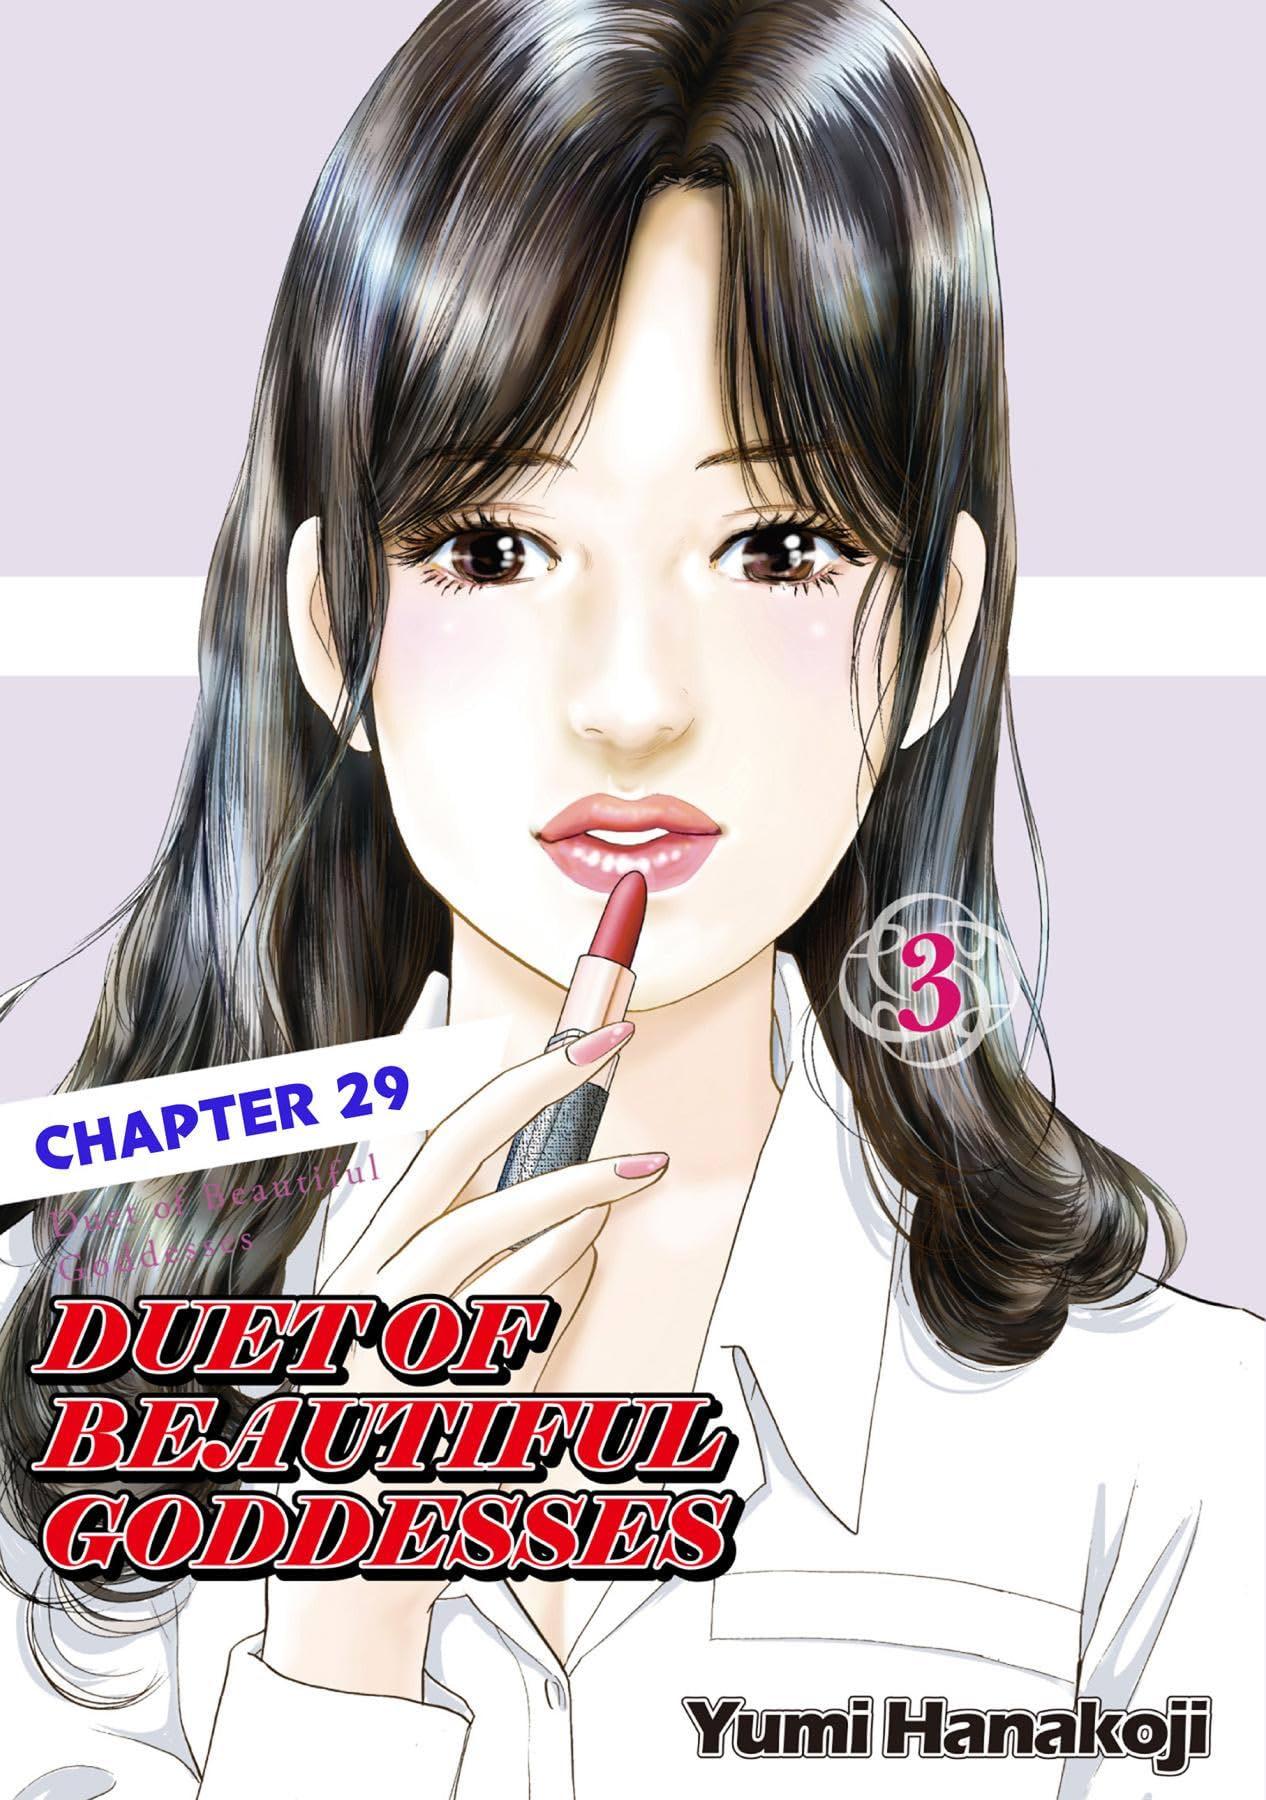 DUET OF BEAUTIFUL GODDESSES #29